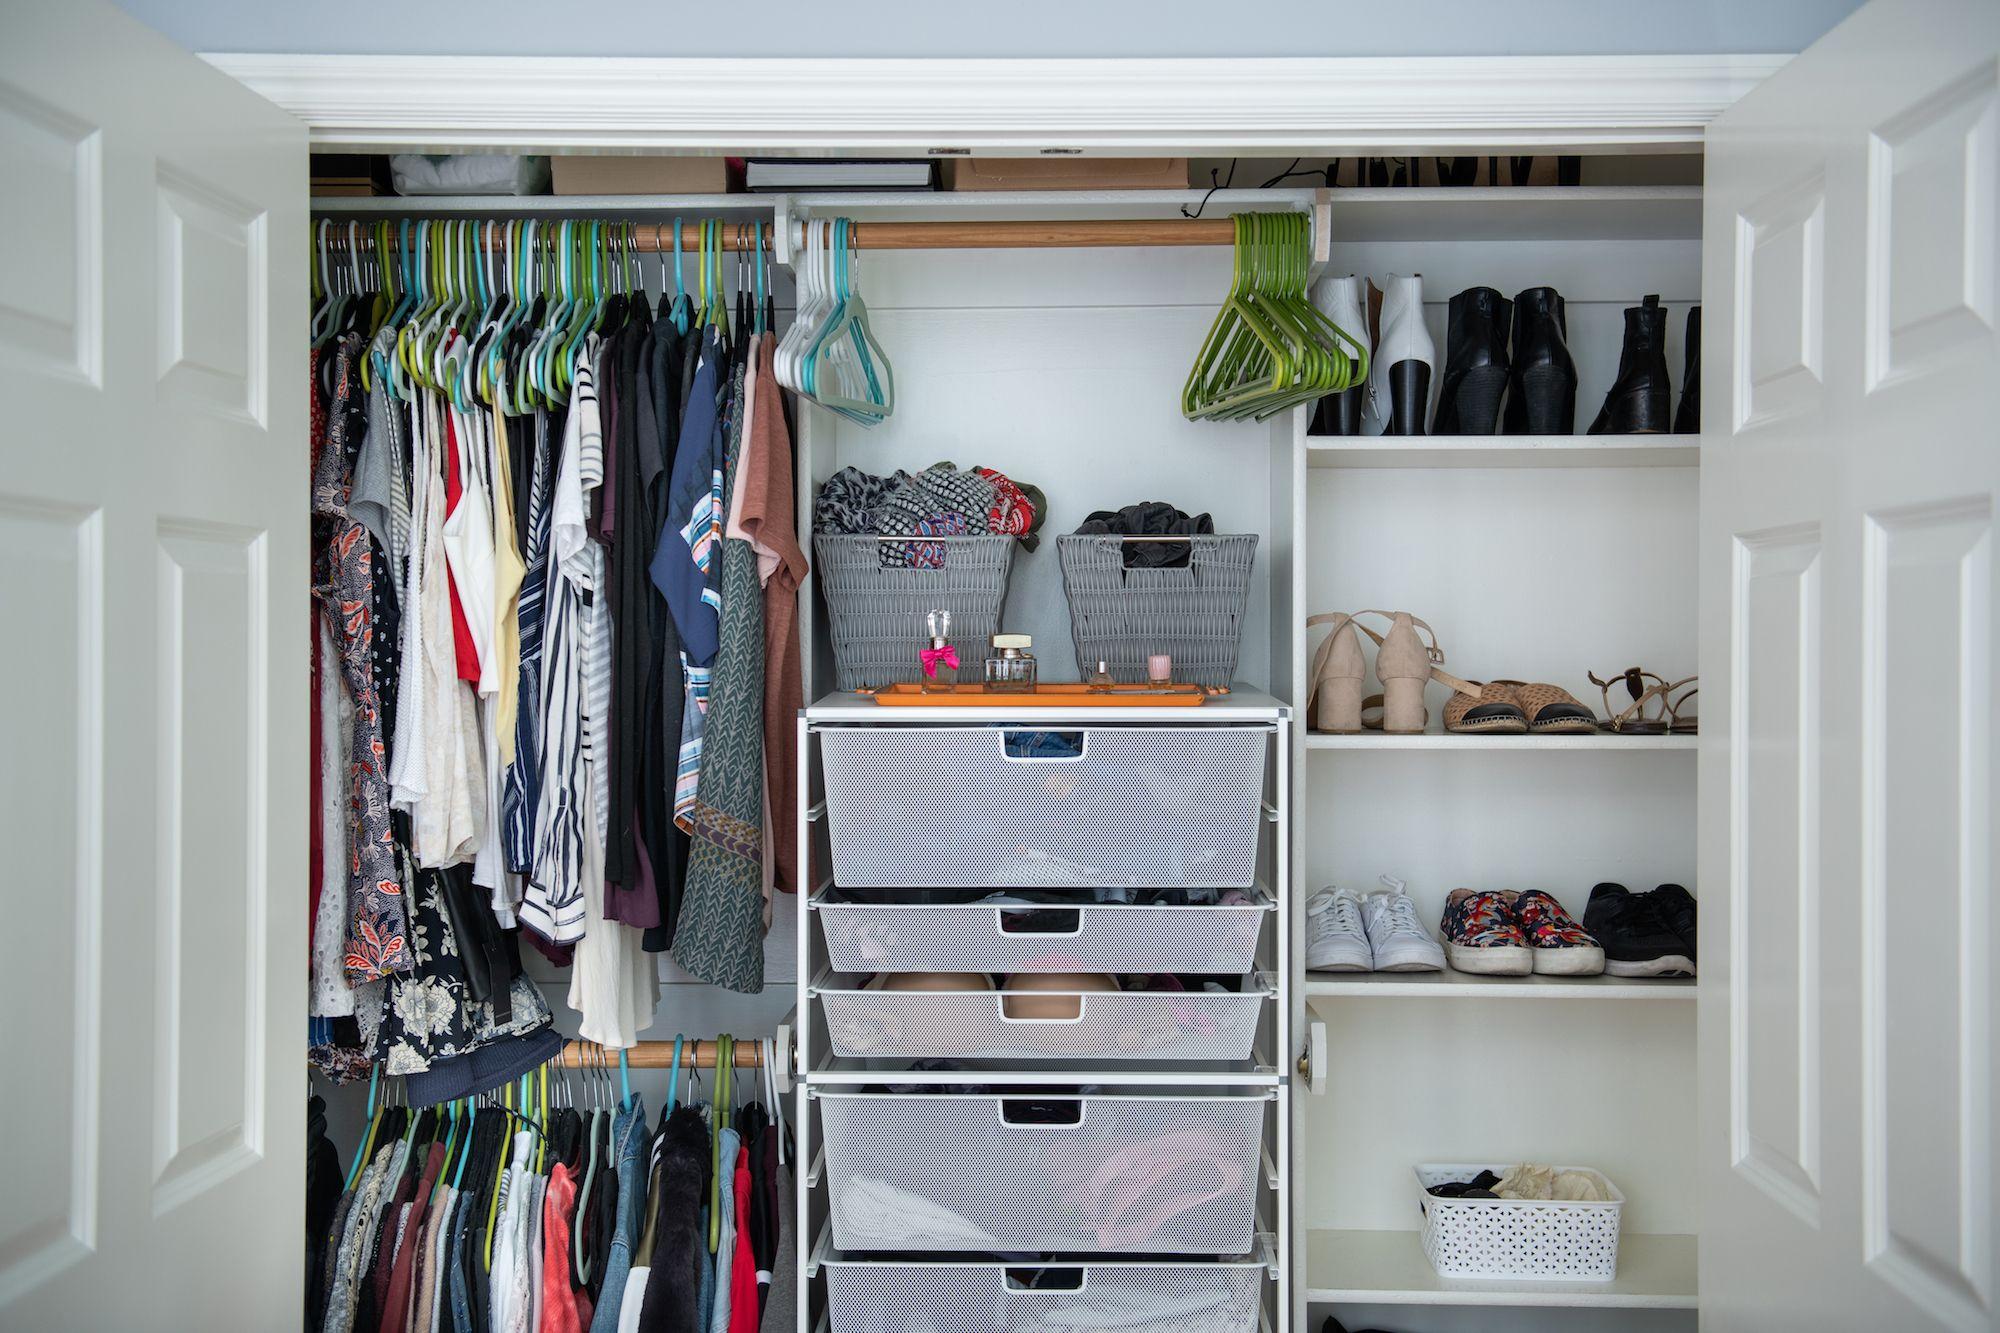 Closet Organization Storage Ideas How To Organize Your Closet